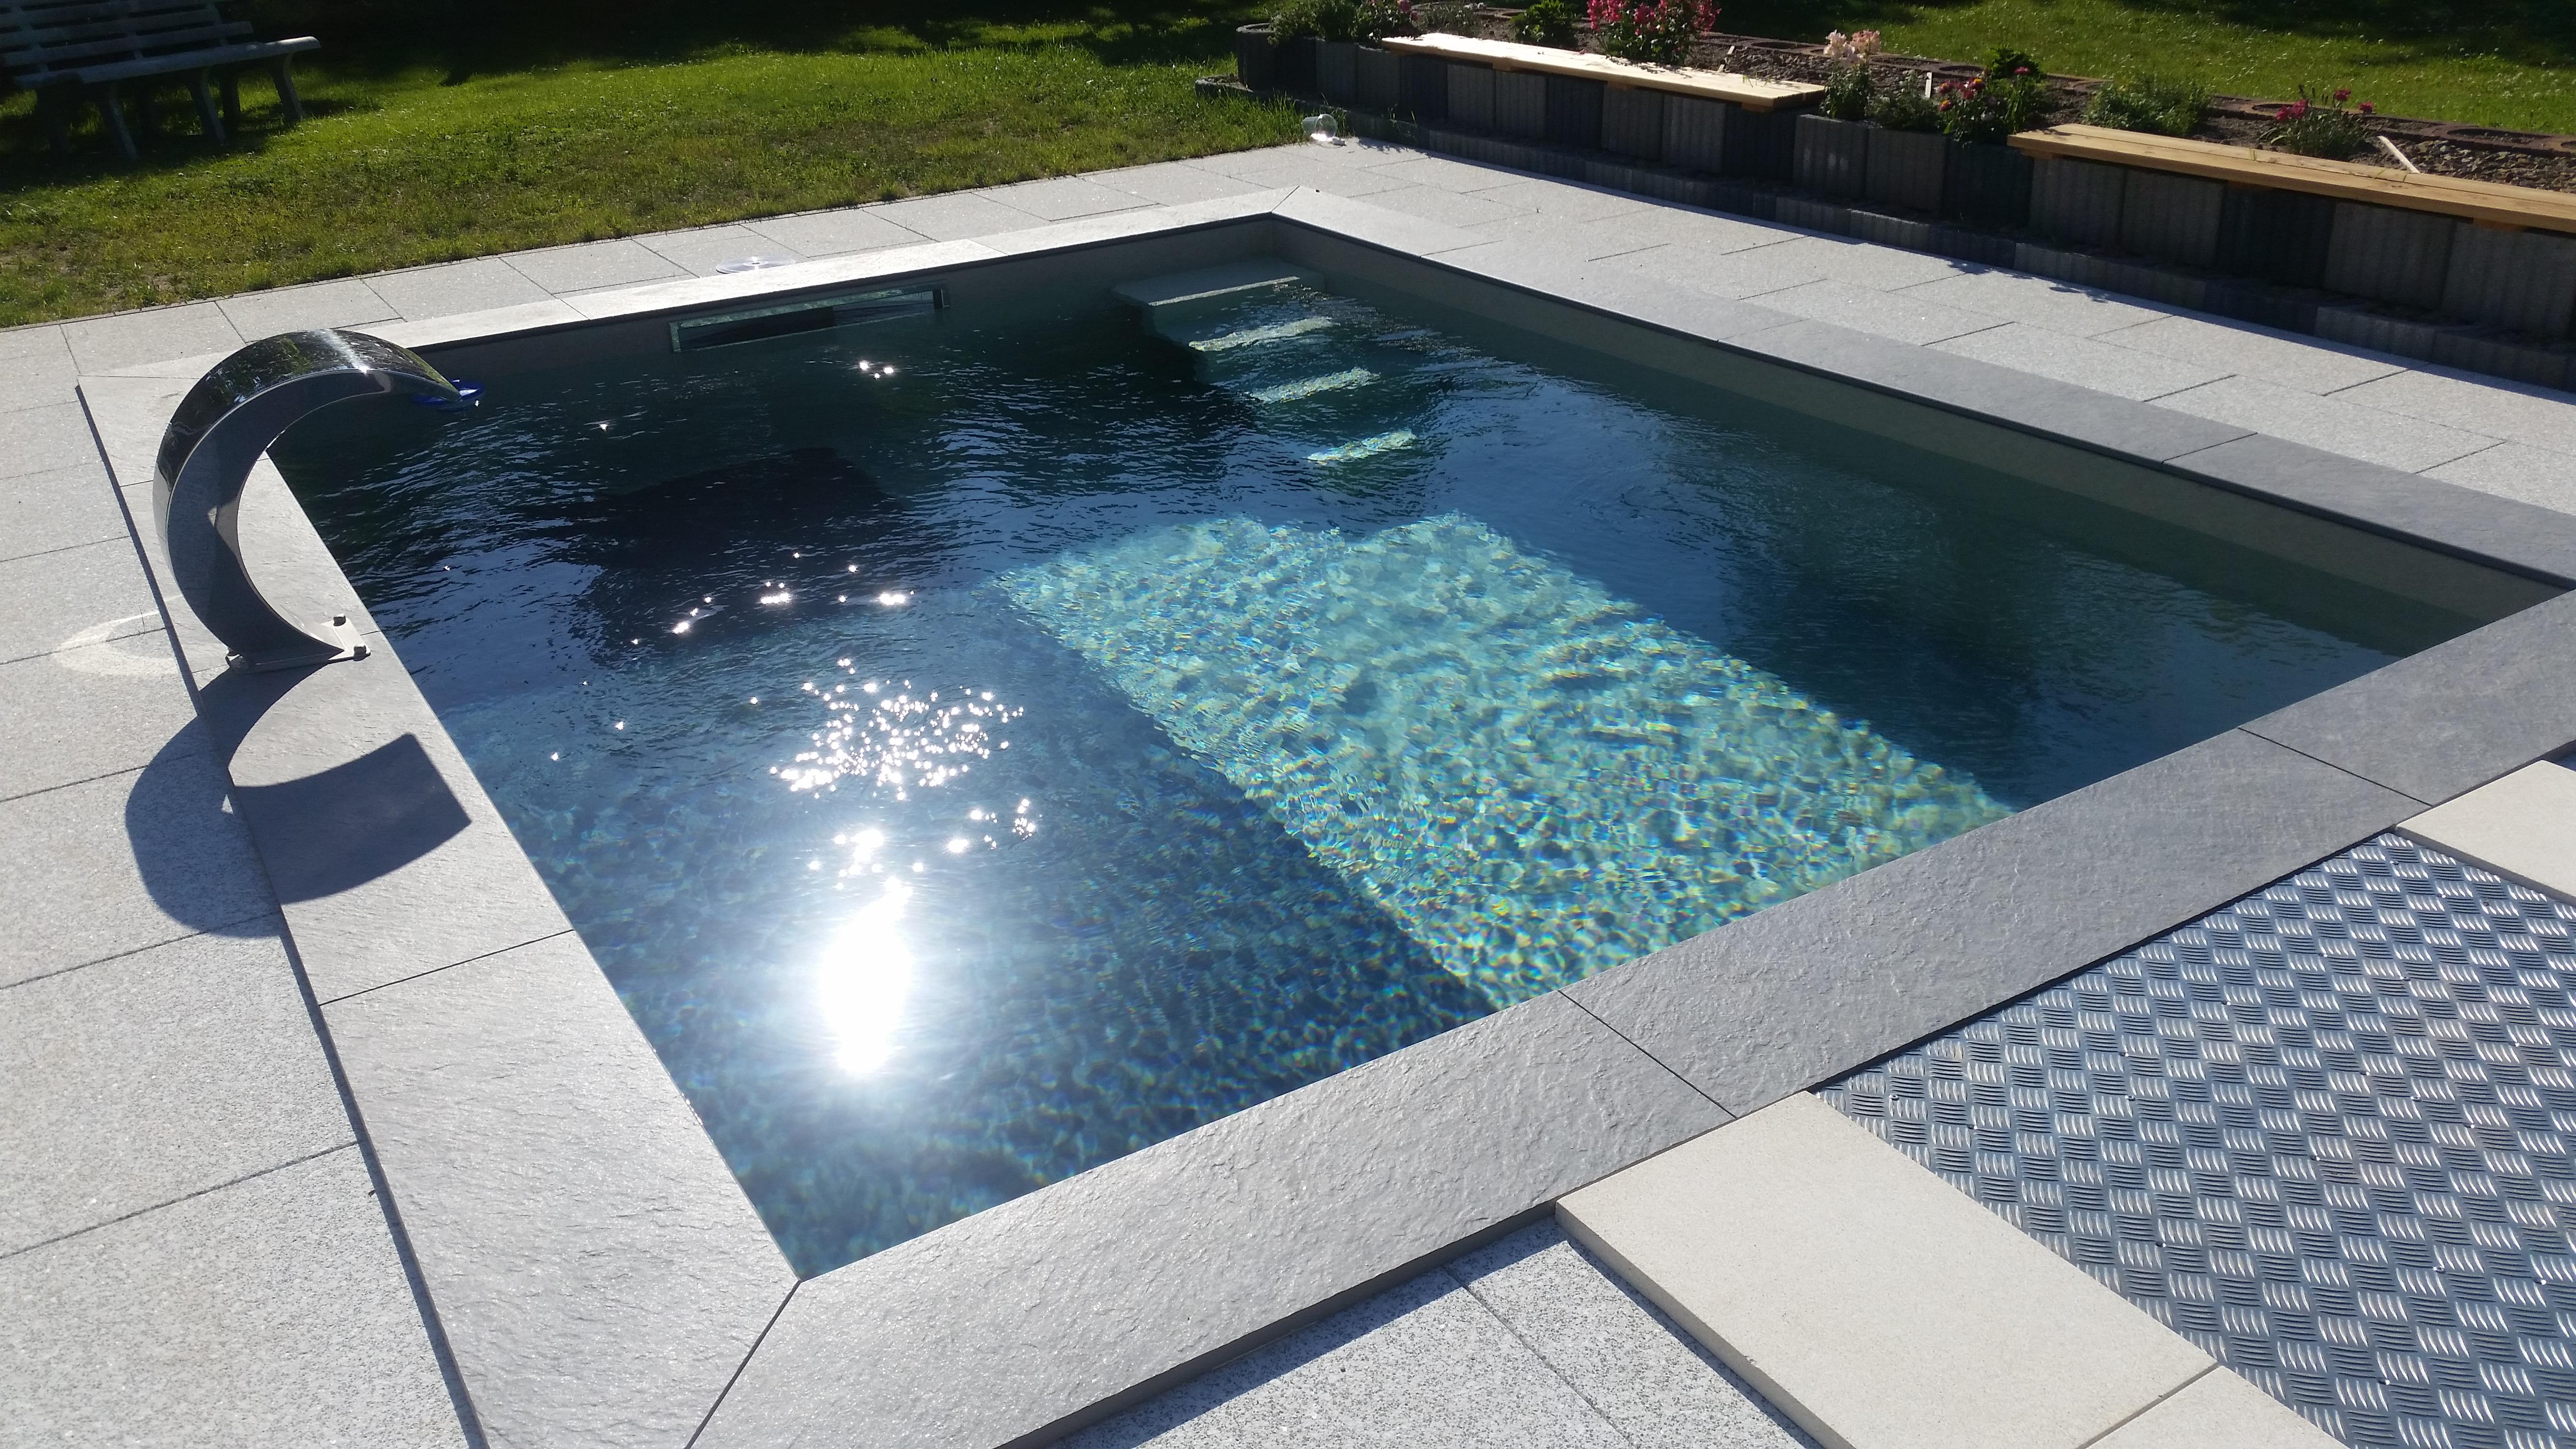 aktuelles aktuelles holiday pool hirsch ug. Black Bedroom Furniture Sets. Home Design Ideas